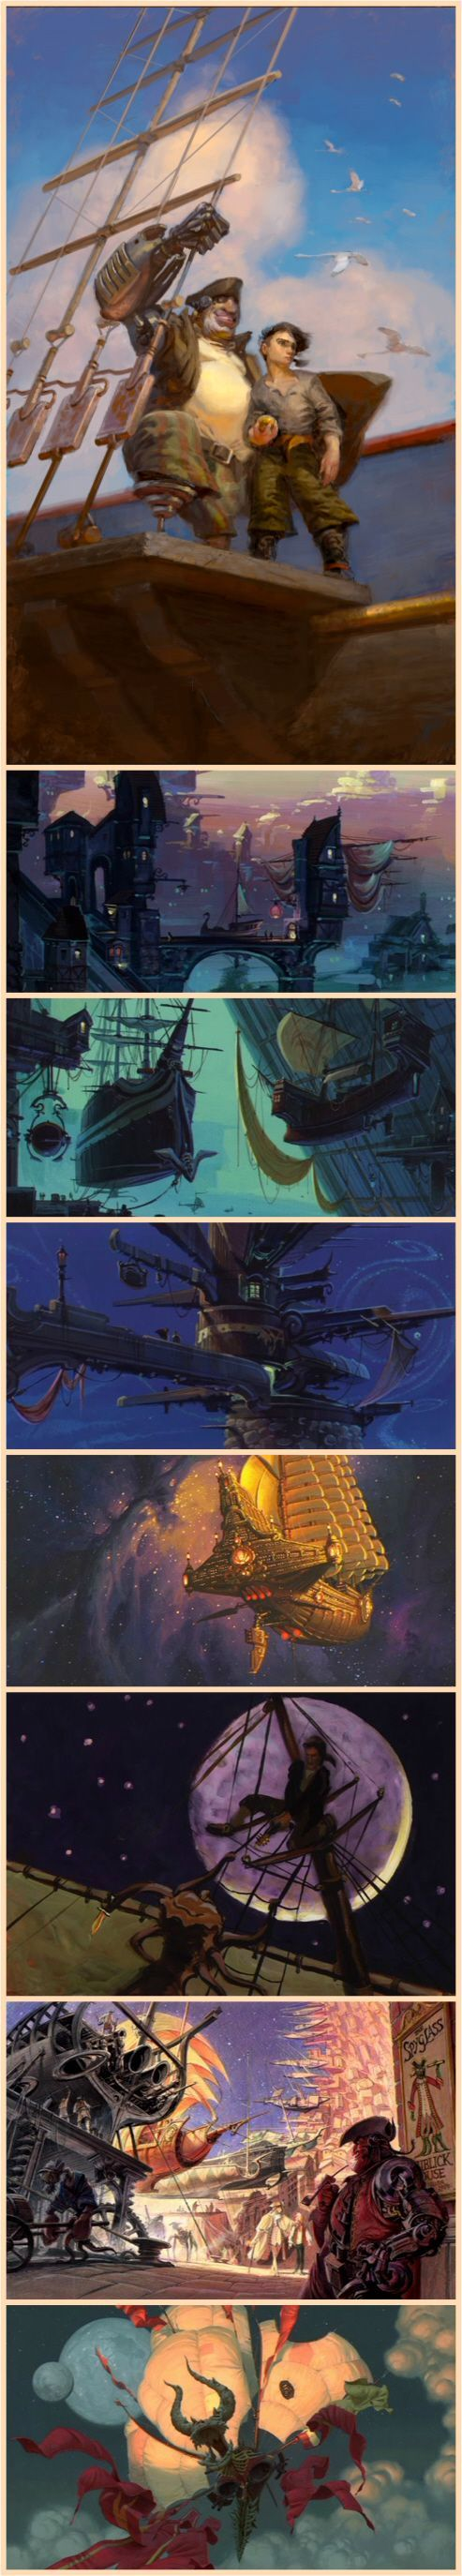 Treasure Planet concept art <3 <3